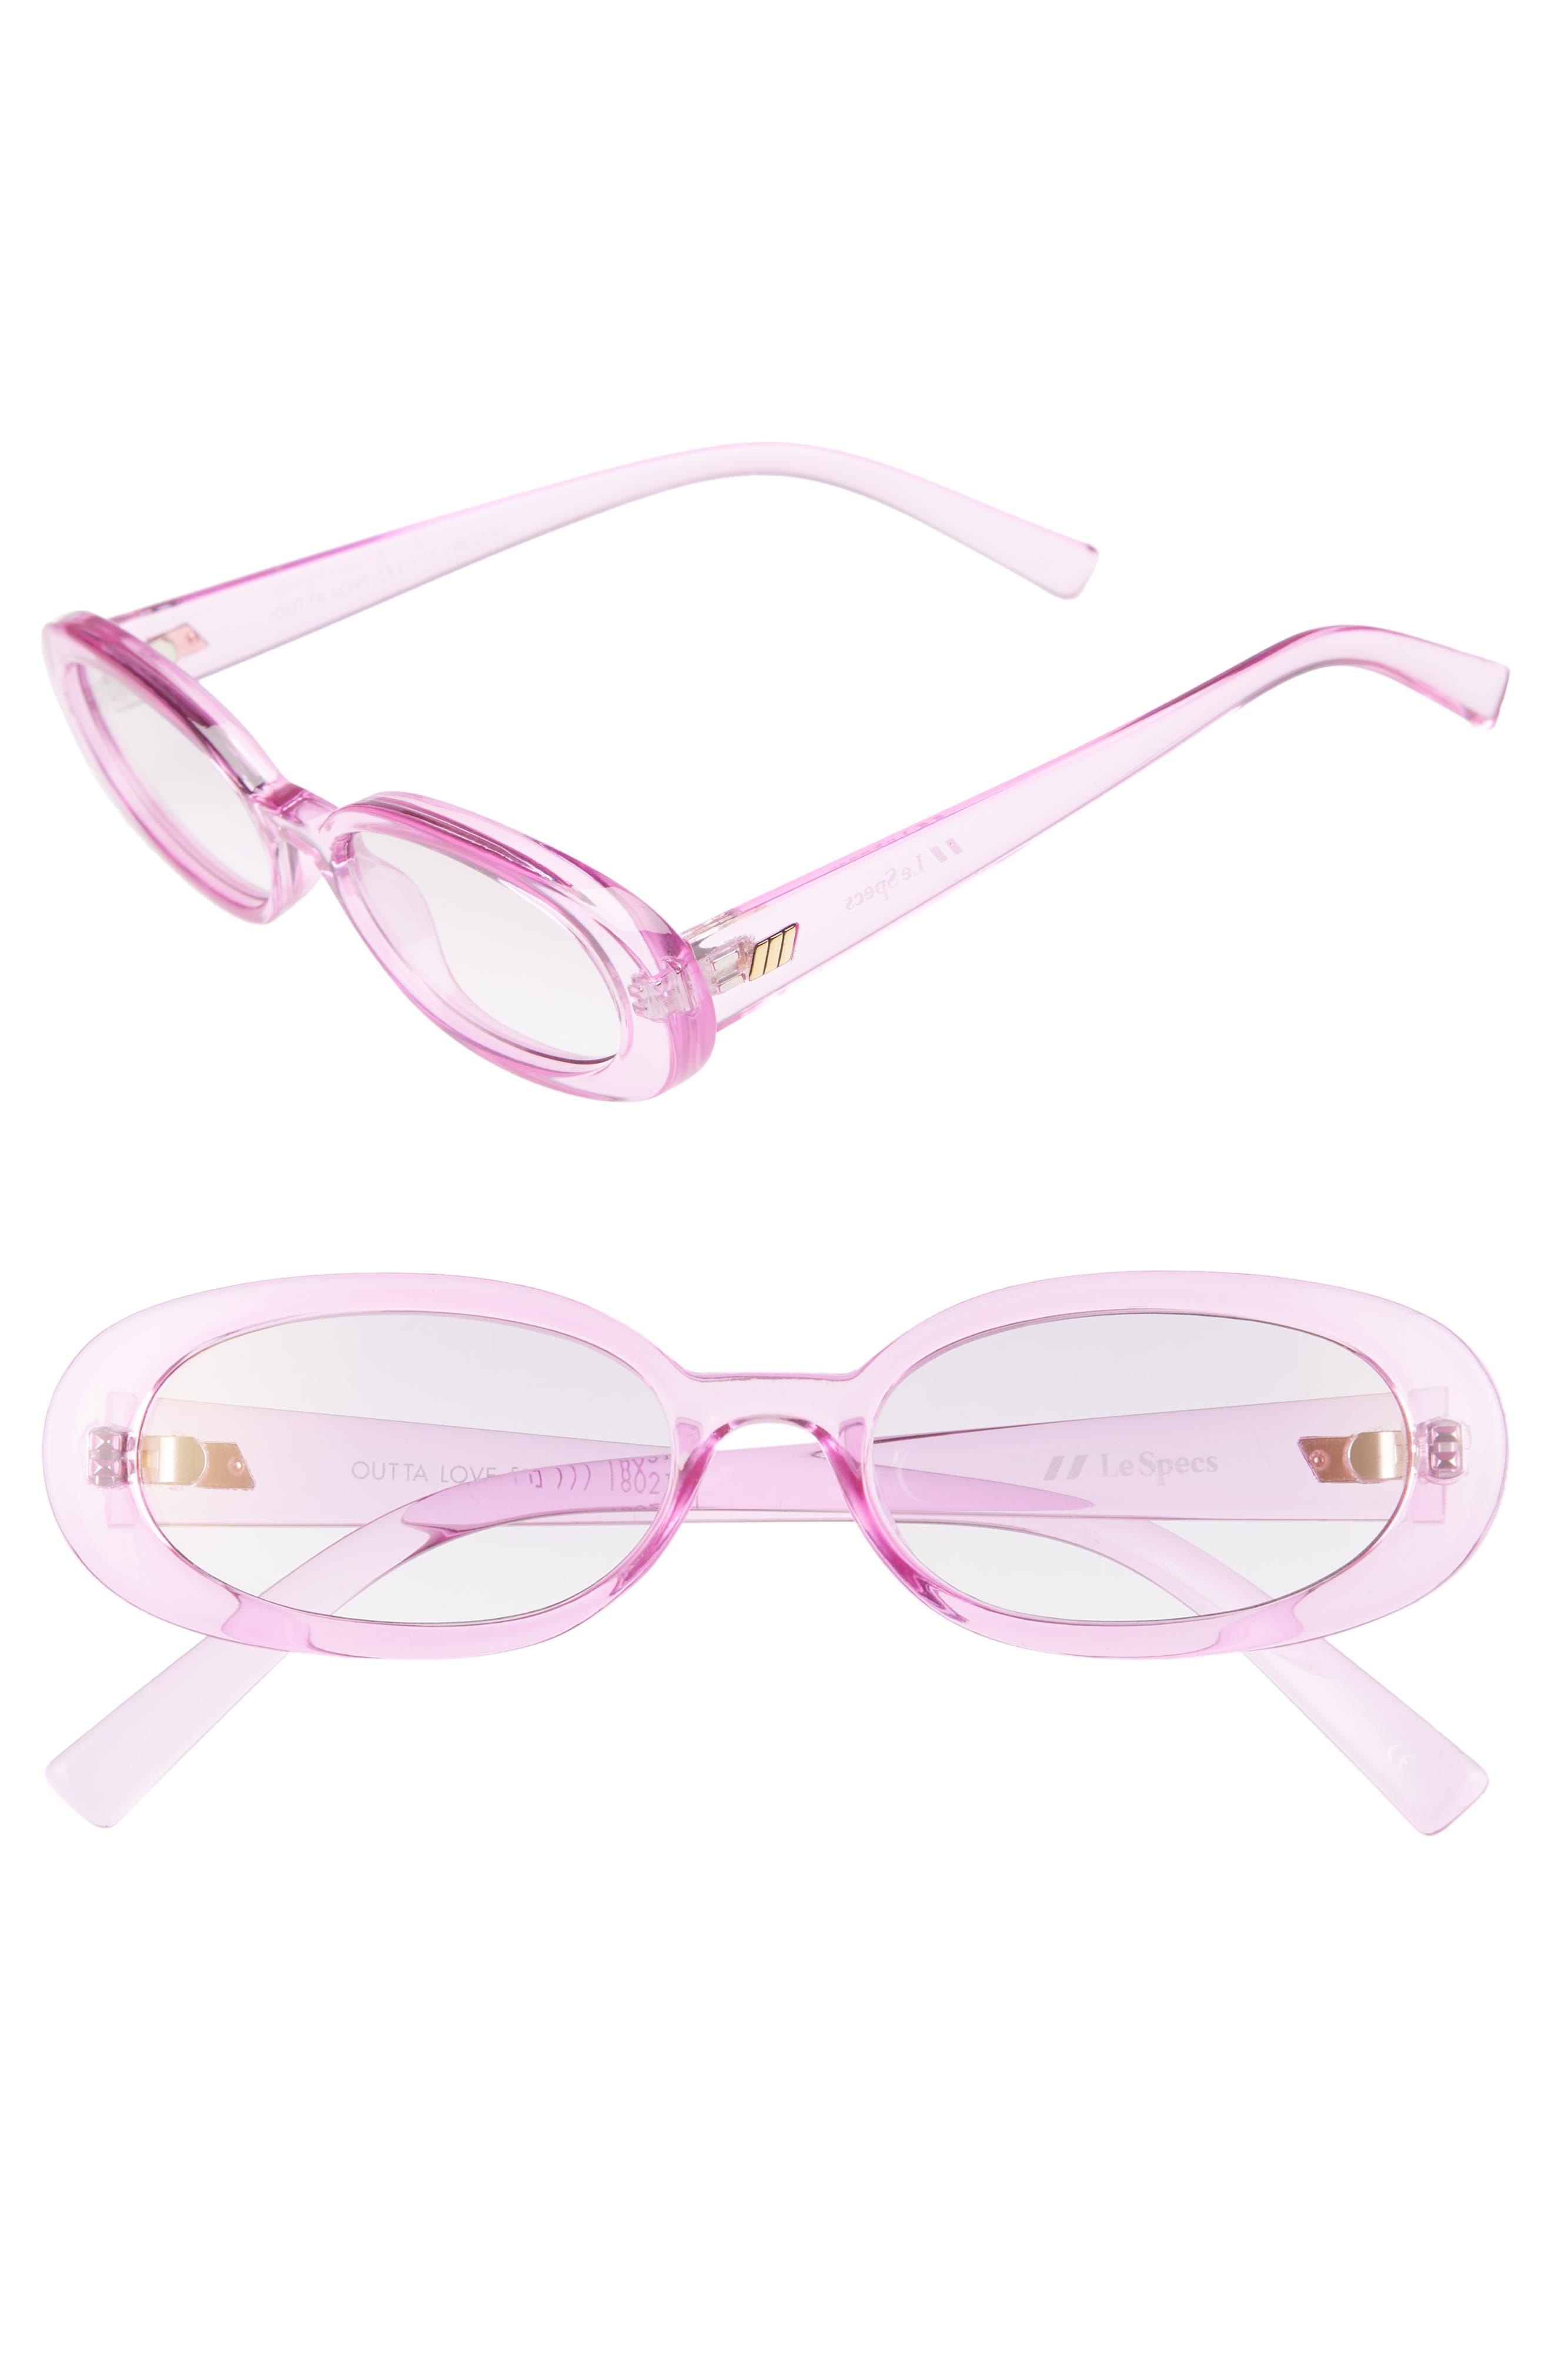 Outta Love 49mm Cat Eye Sunglasses,                             Main thumbnail 1, color,                             Powder-Puff